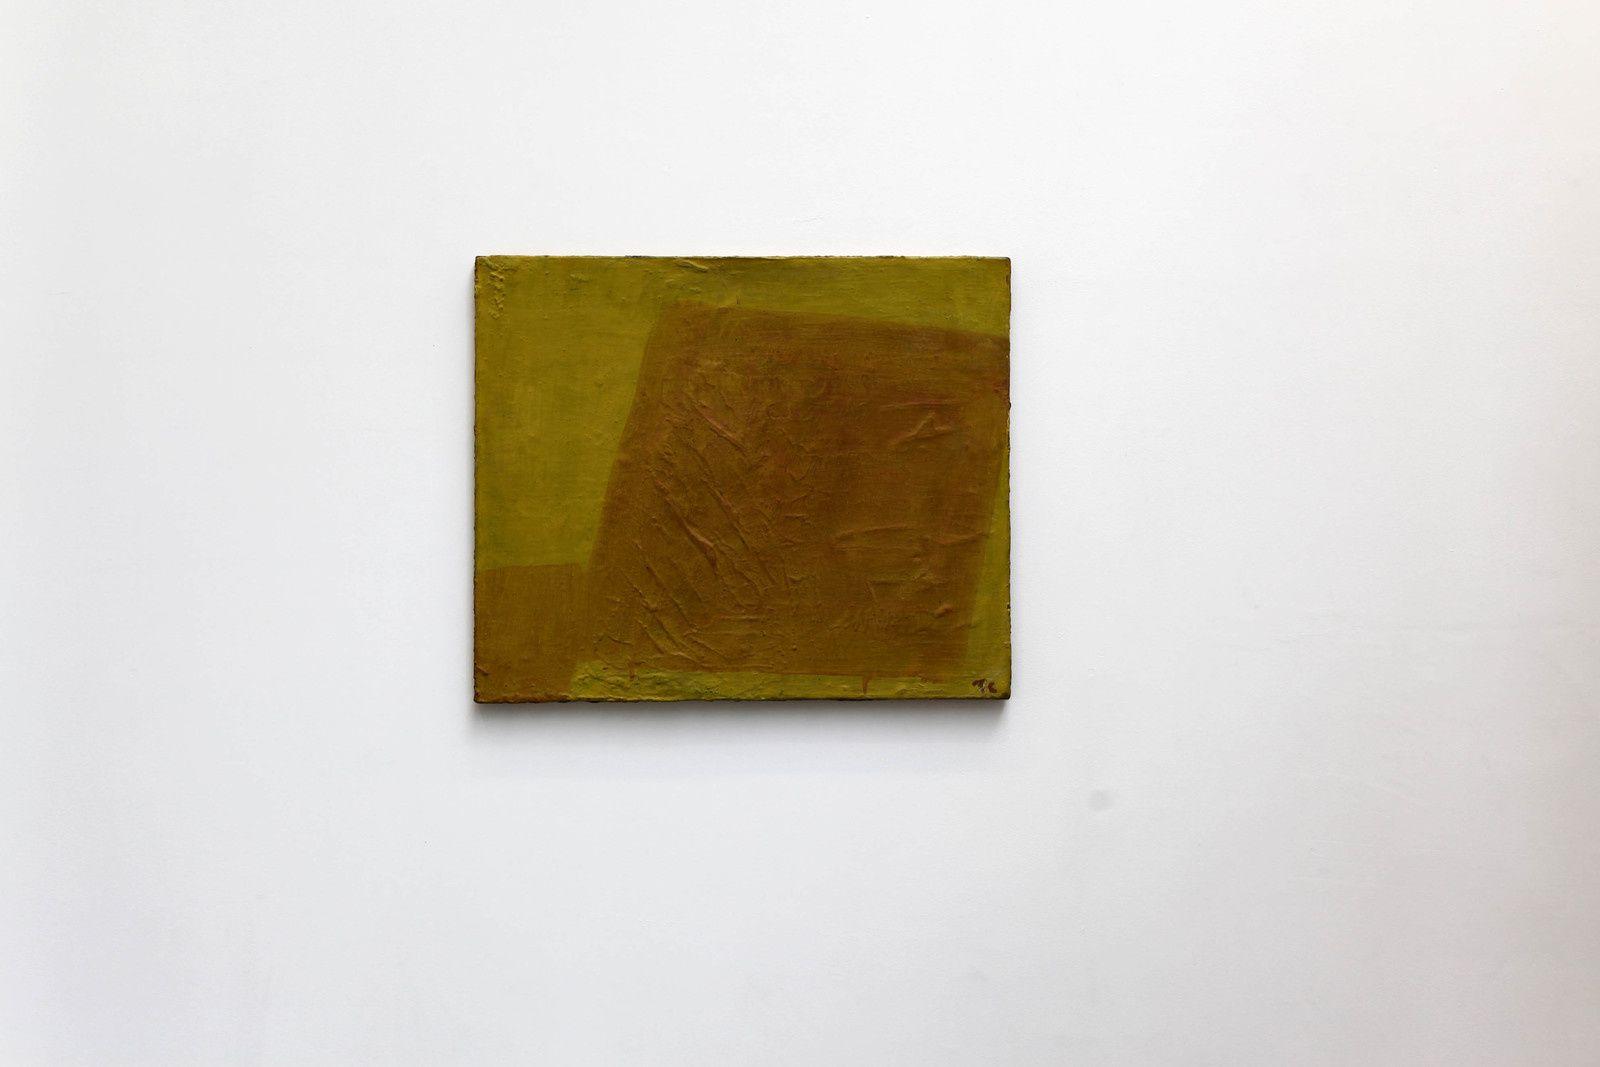 Pierre TAL COAT - Courtesy Galerie Christophe Gaillard © Photo Éric Simon